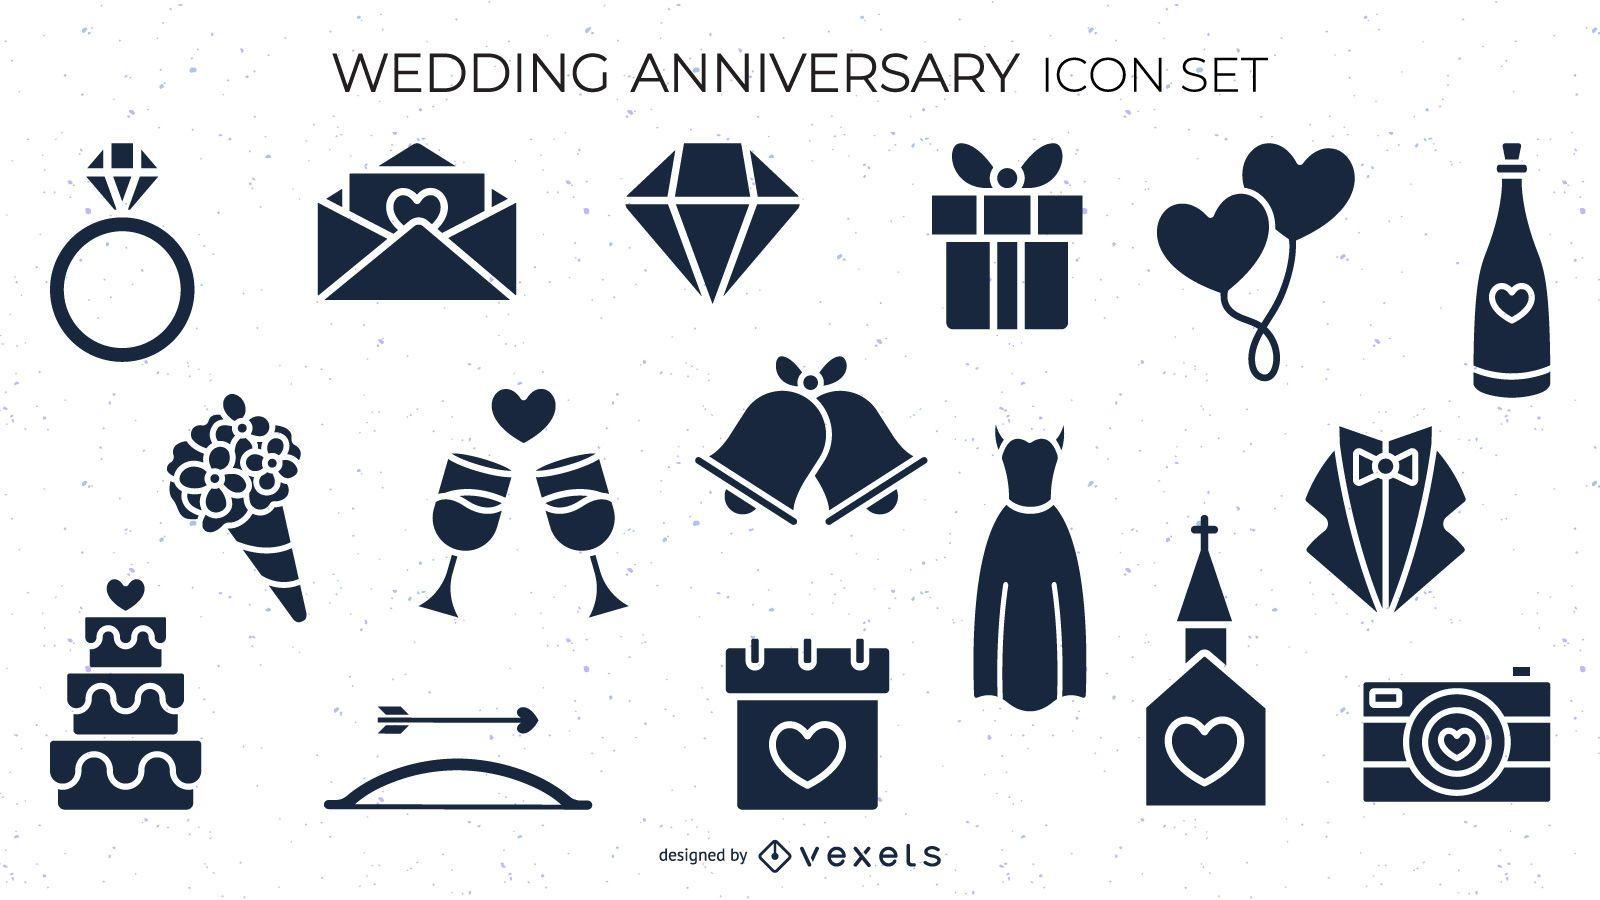 Wedding anniversary icon set